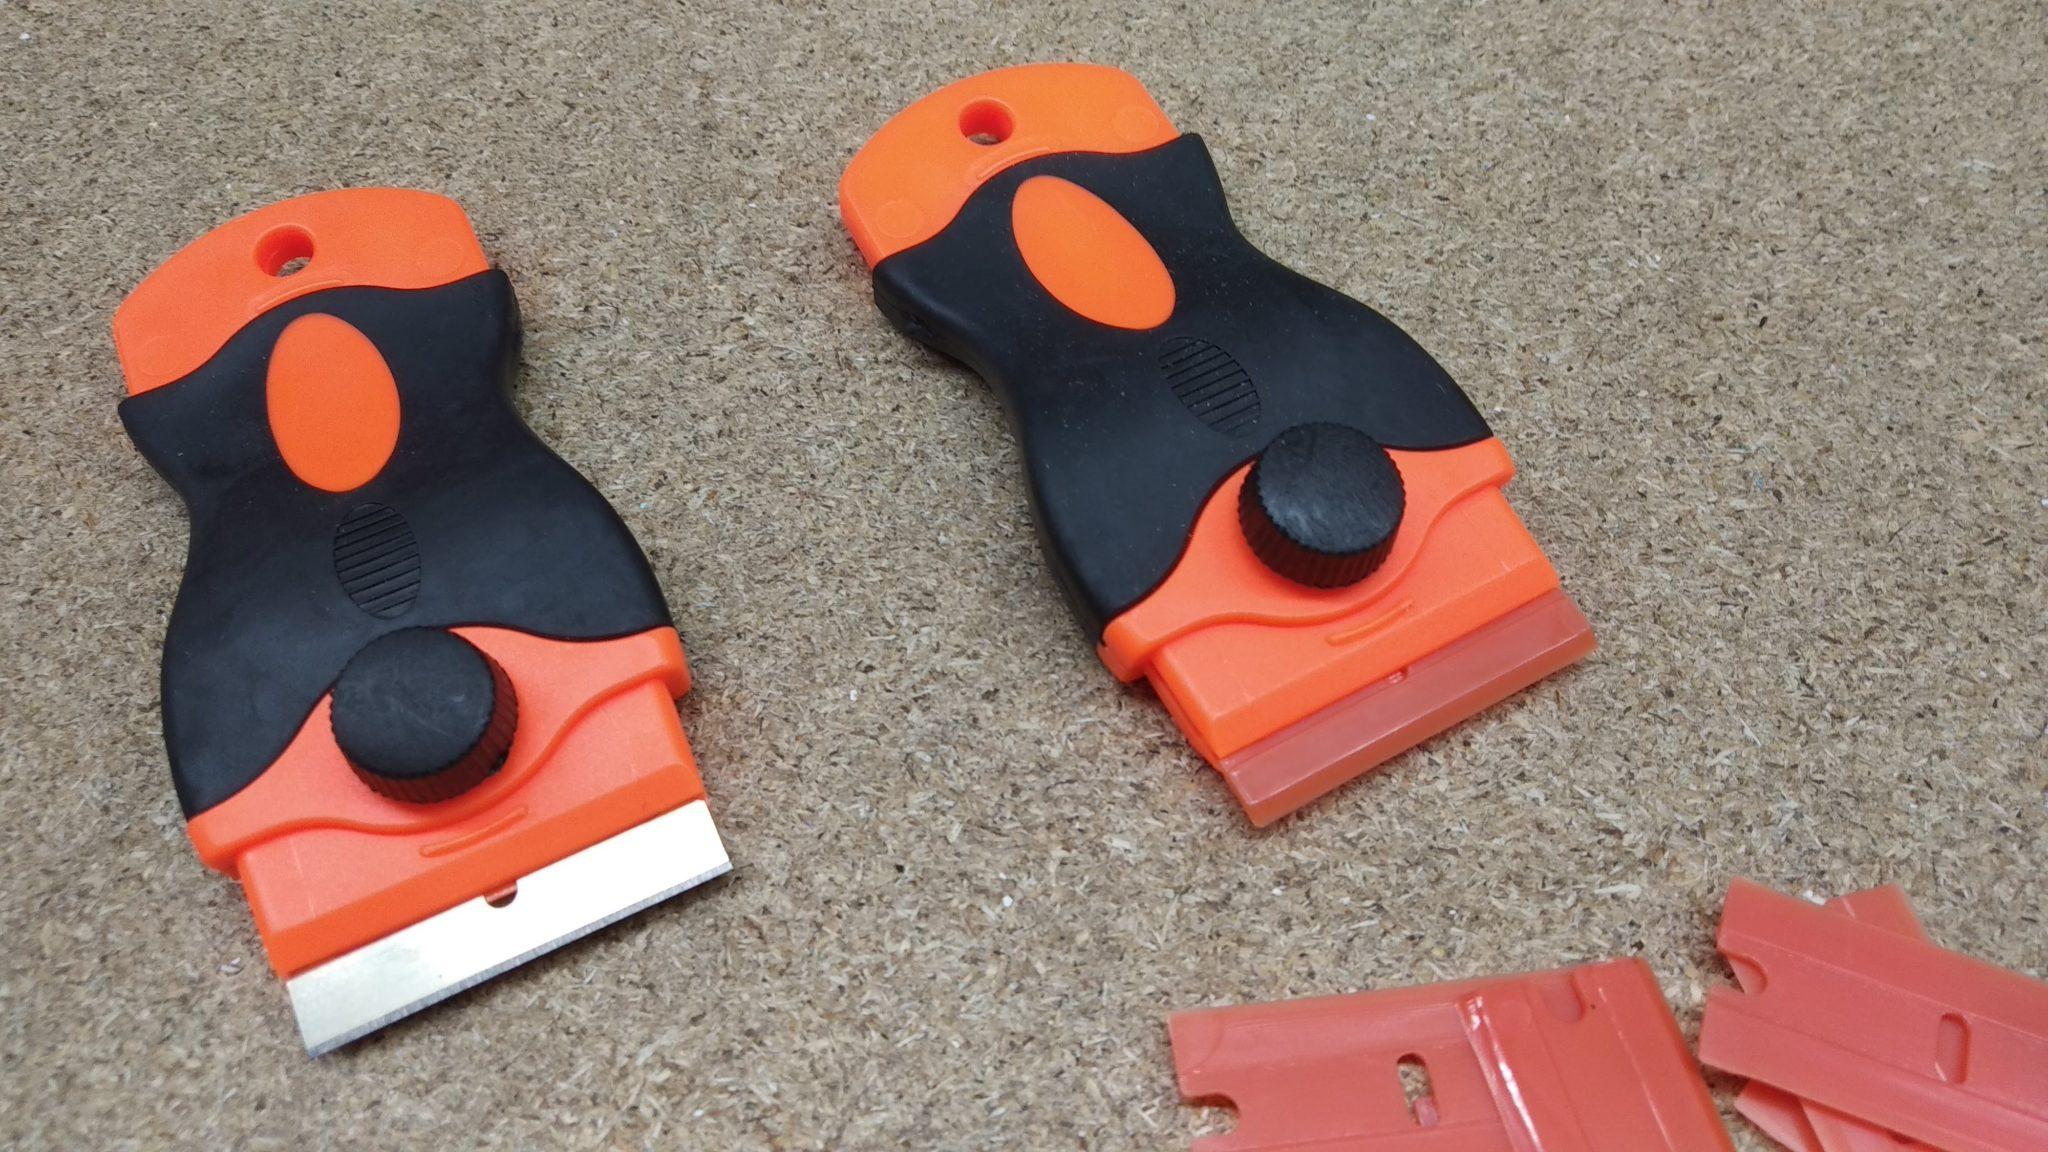 FEPshop Razor blades with holder (Metal/Plastic)